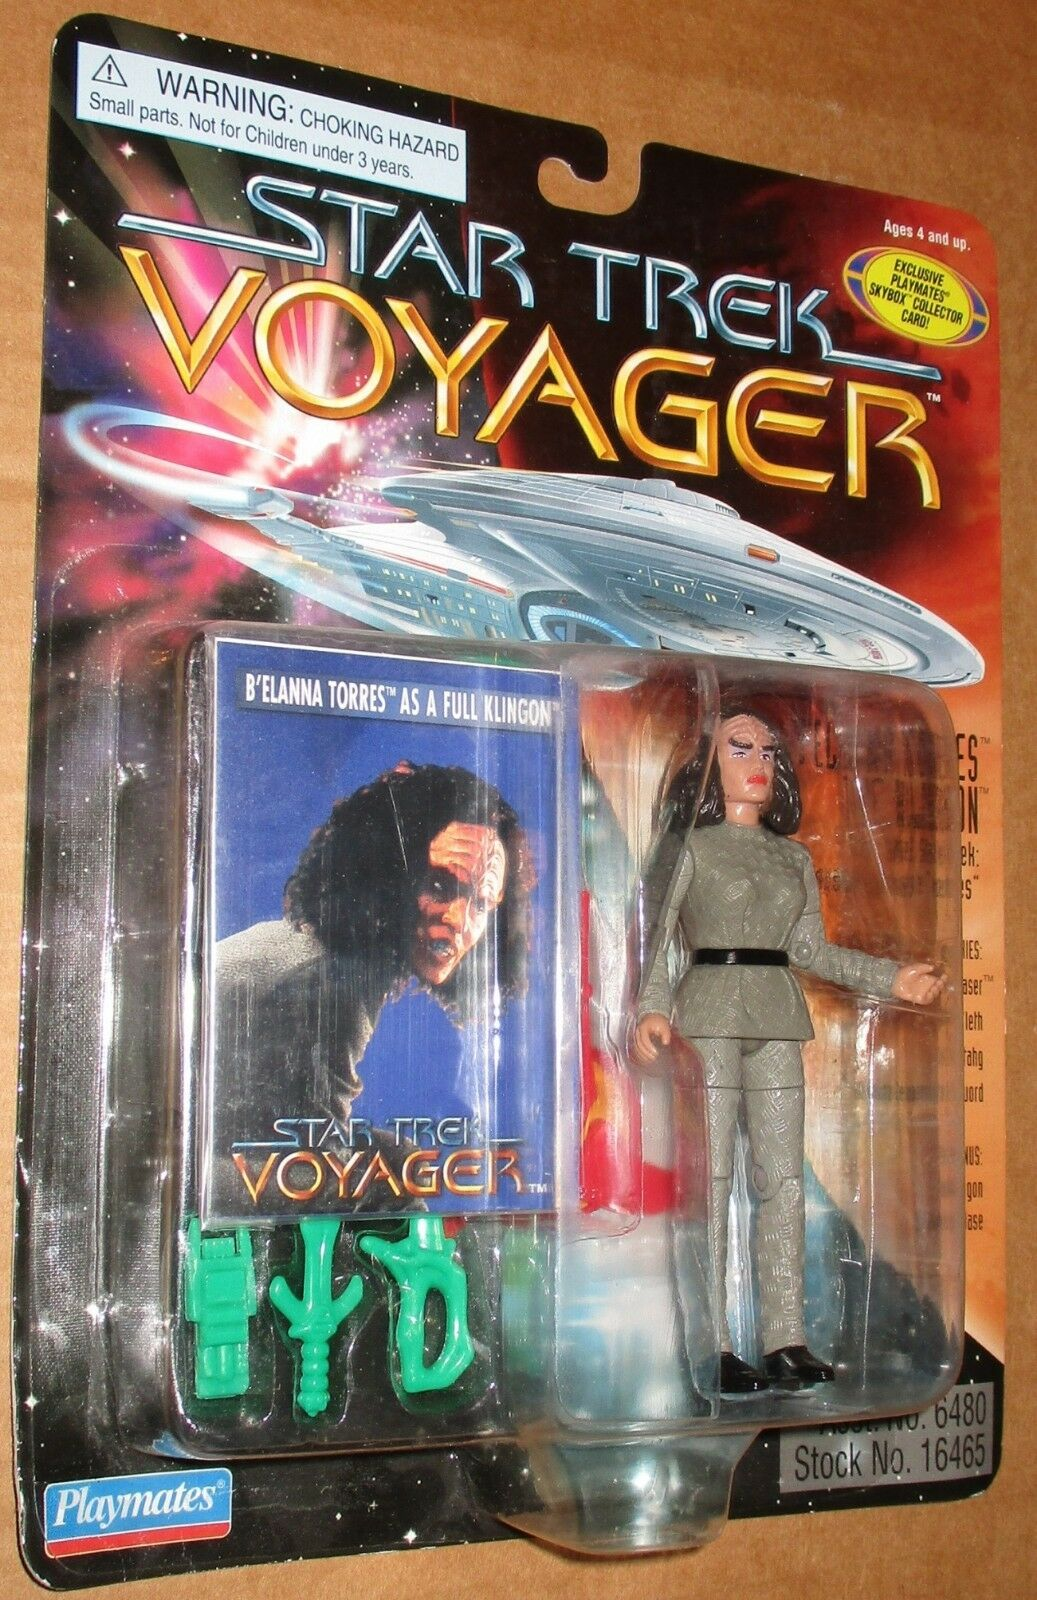 000002 Star Trek Voyager Niedrig Number B'Elanna Torres Klingon MOC 1996 Playmates